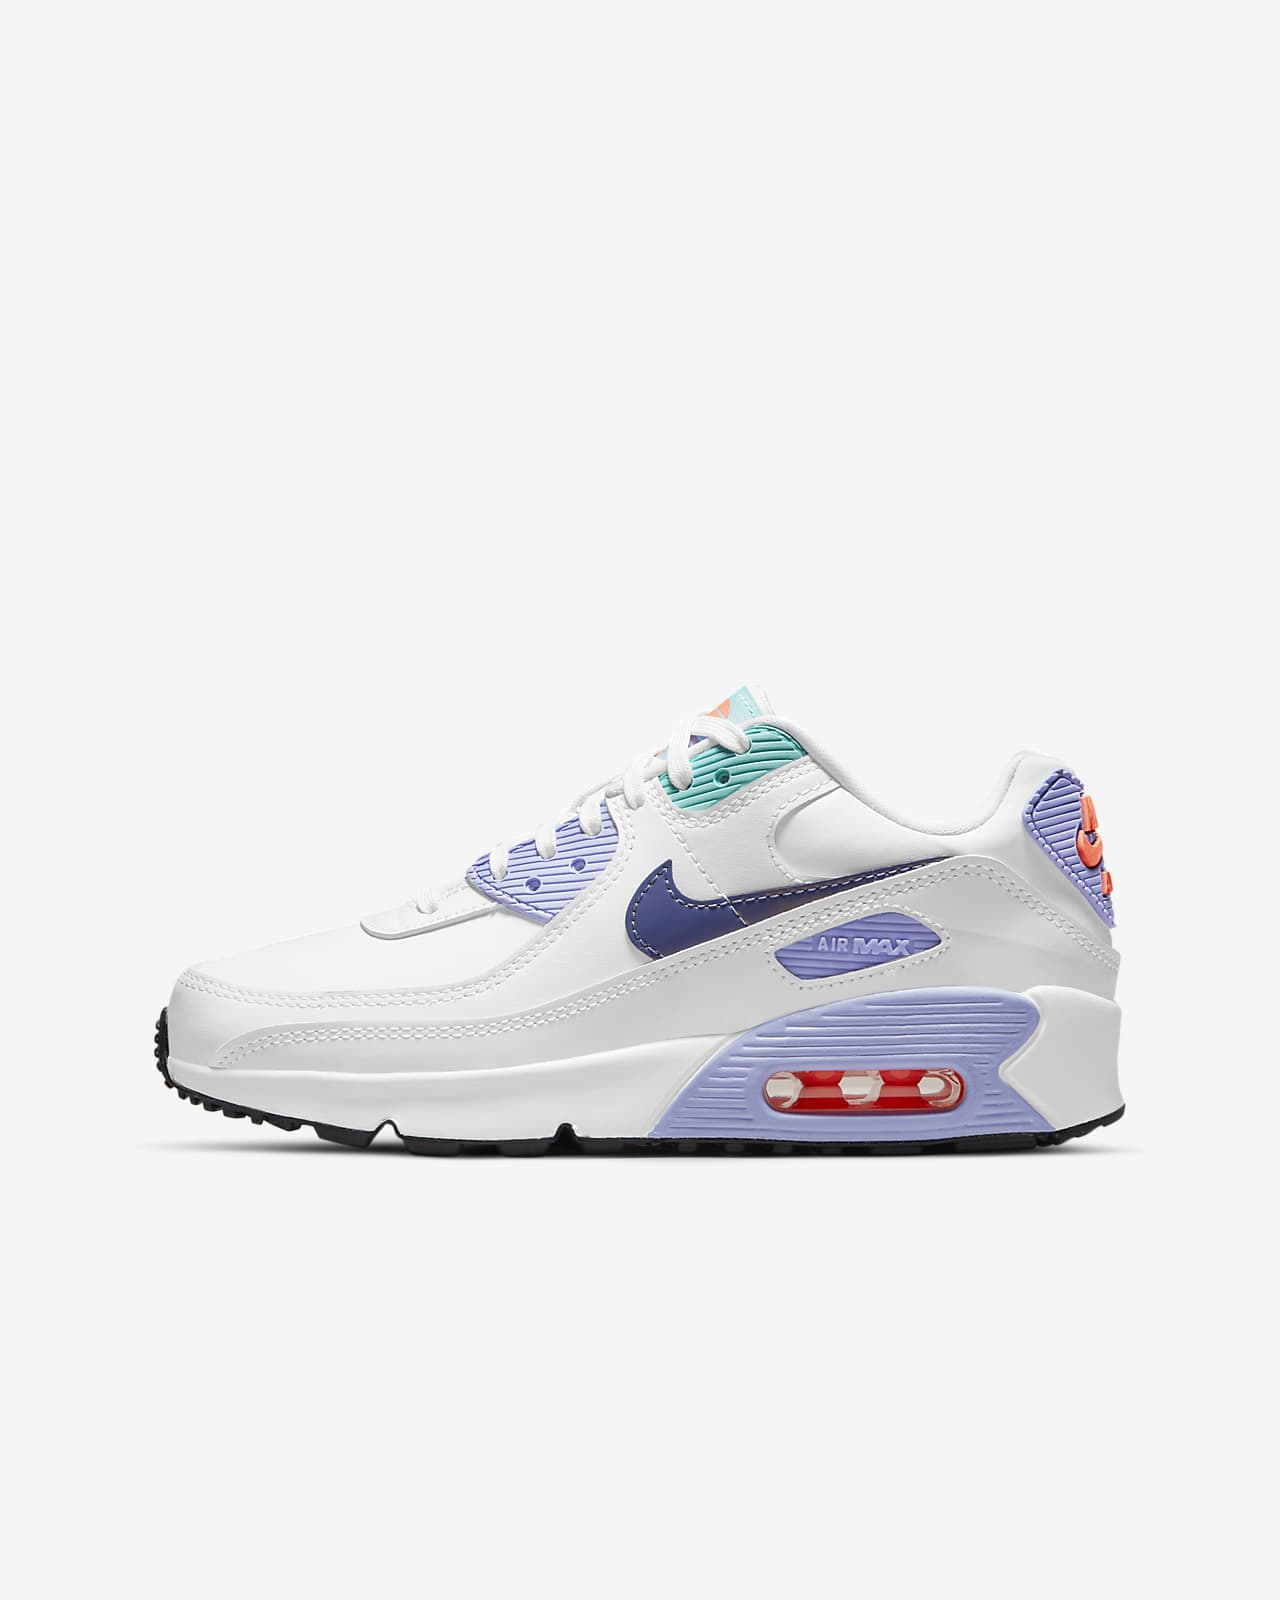 Nike Air Max 90 SE 2 Schuh für ältere Kinder